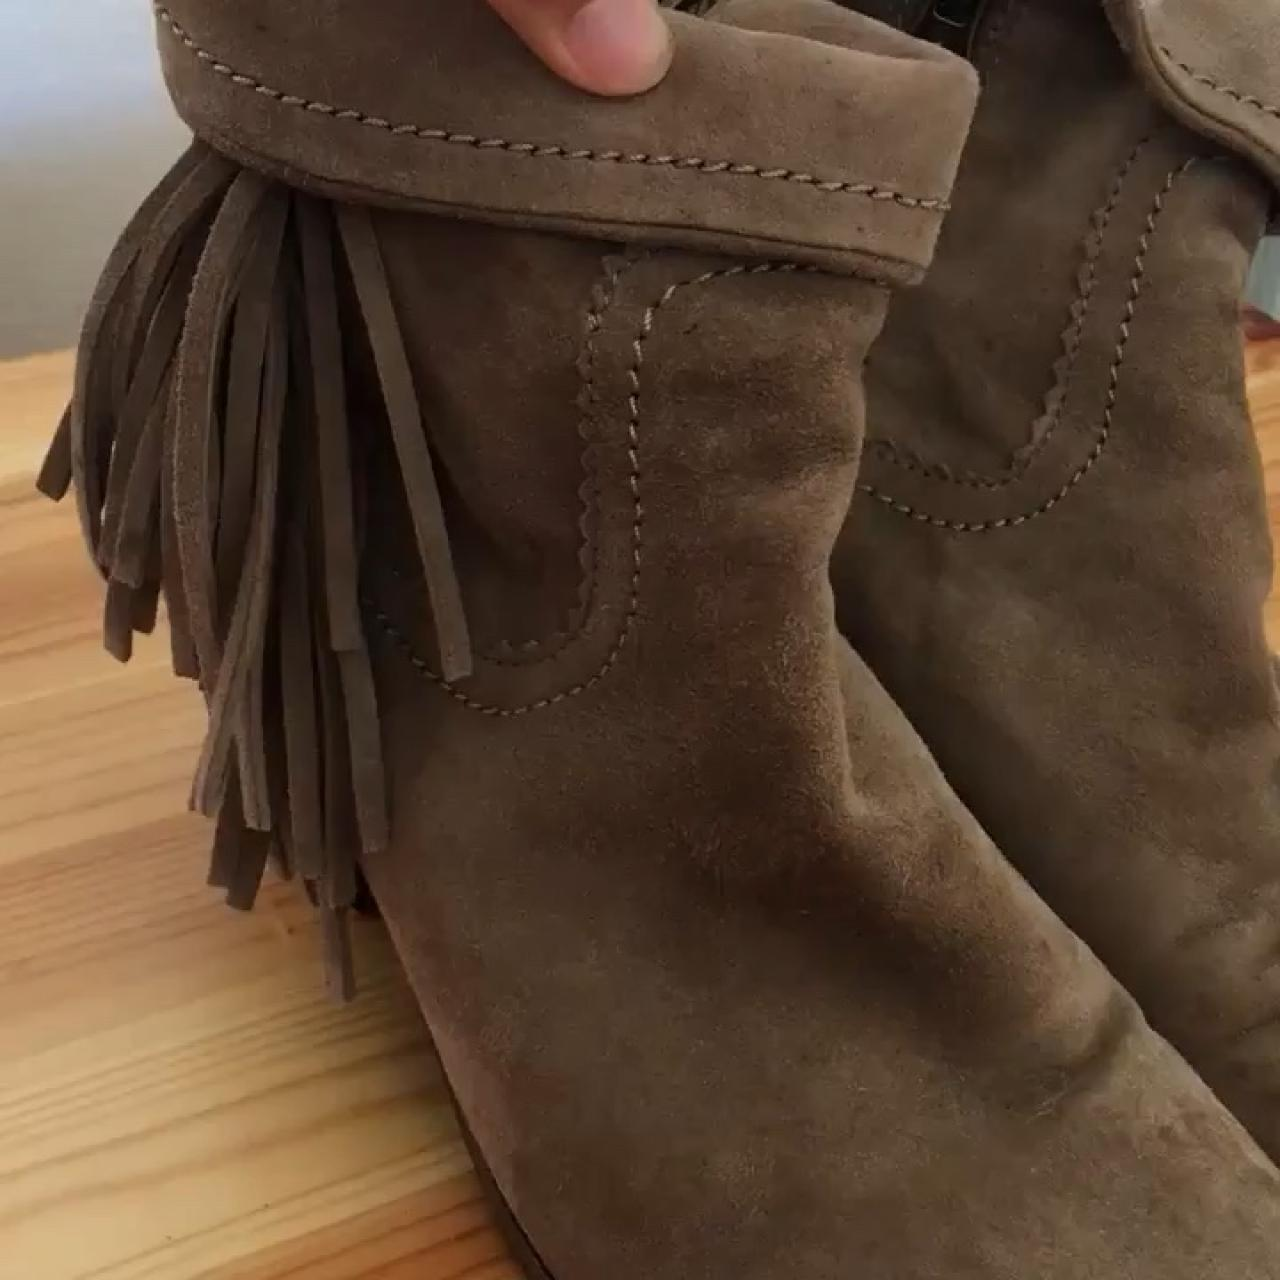 d25512dcc Sam Edelman fringe ankle booties. In good condition. - Depop